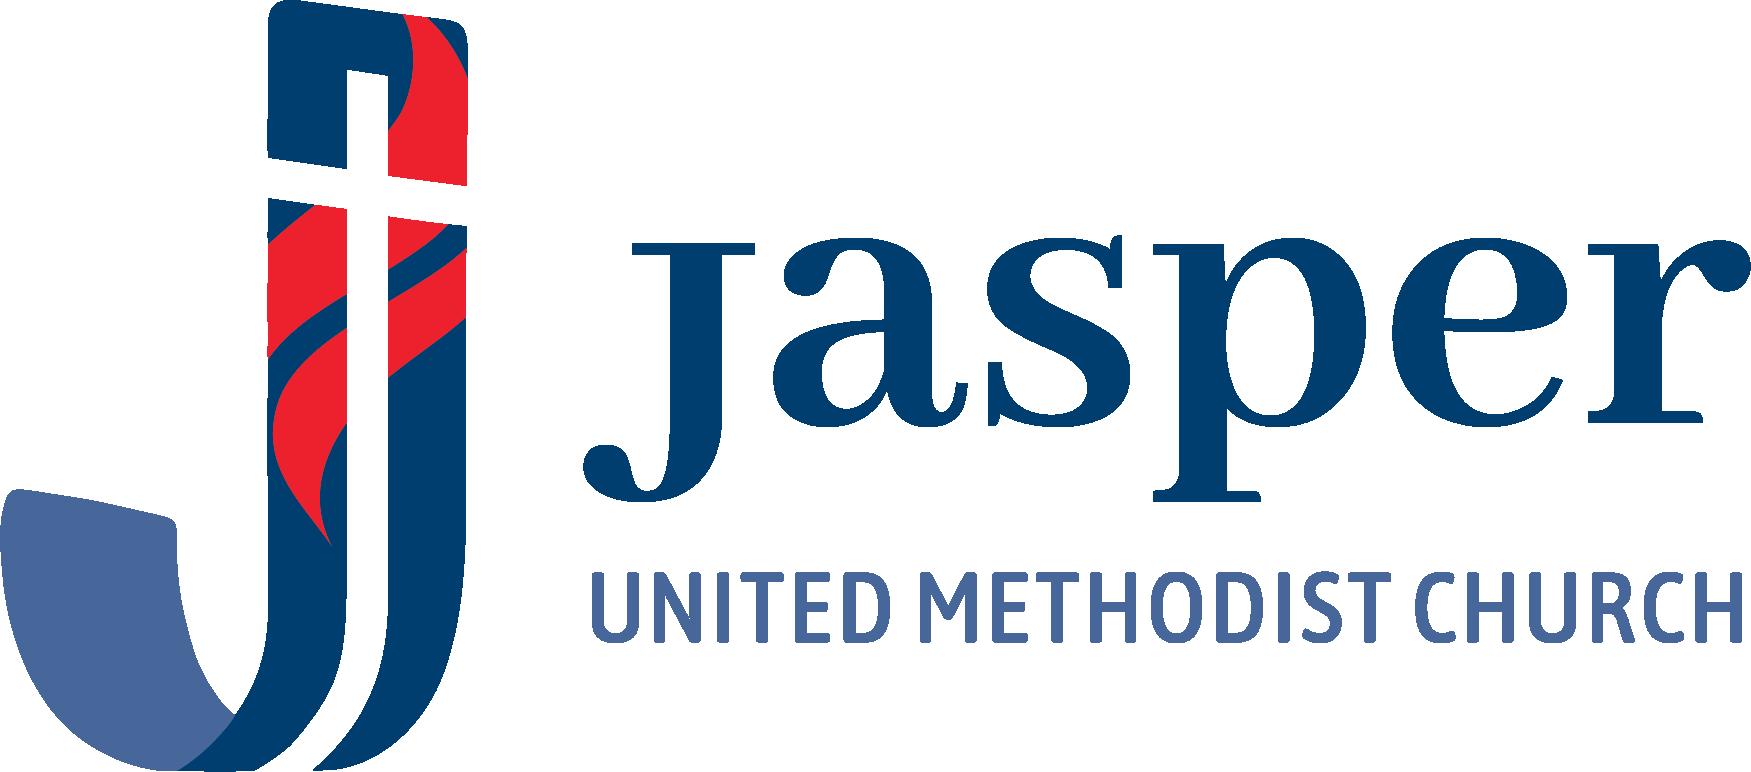 JasperUMC